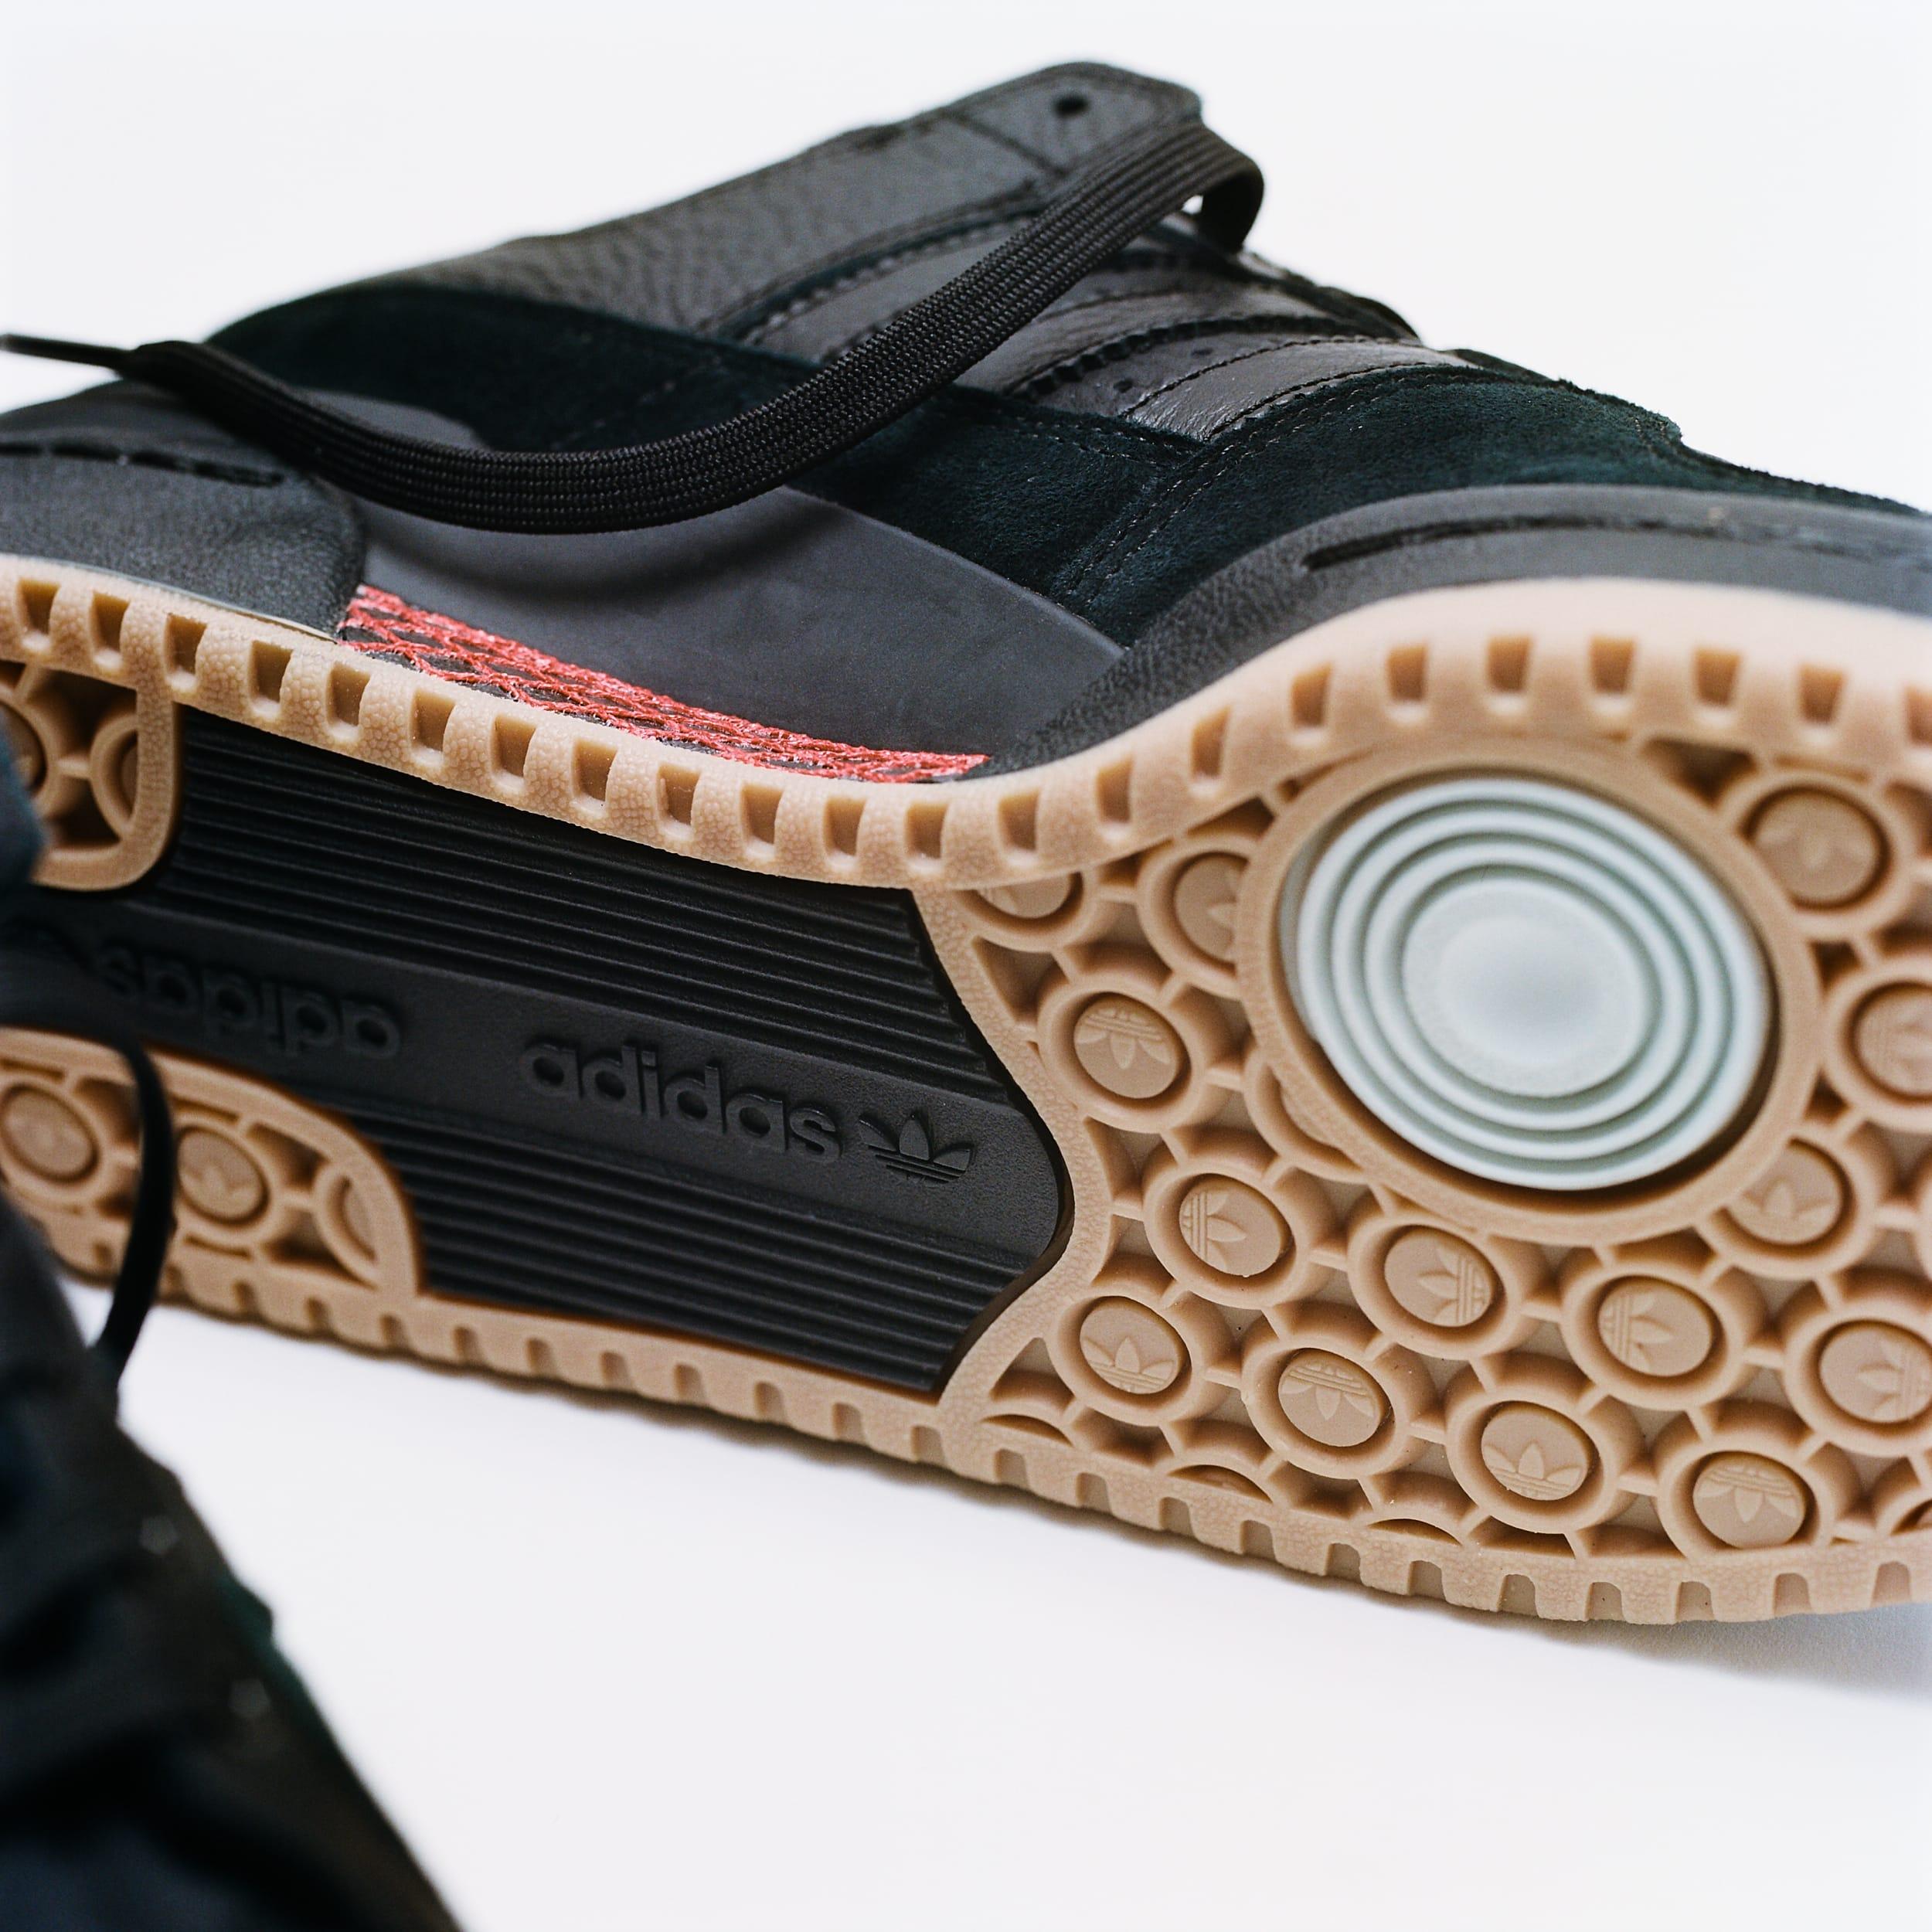 Adidas Forum 84 ADV Black Outsole